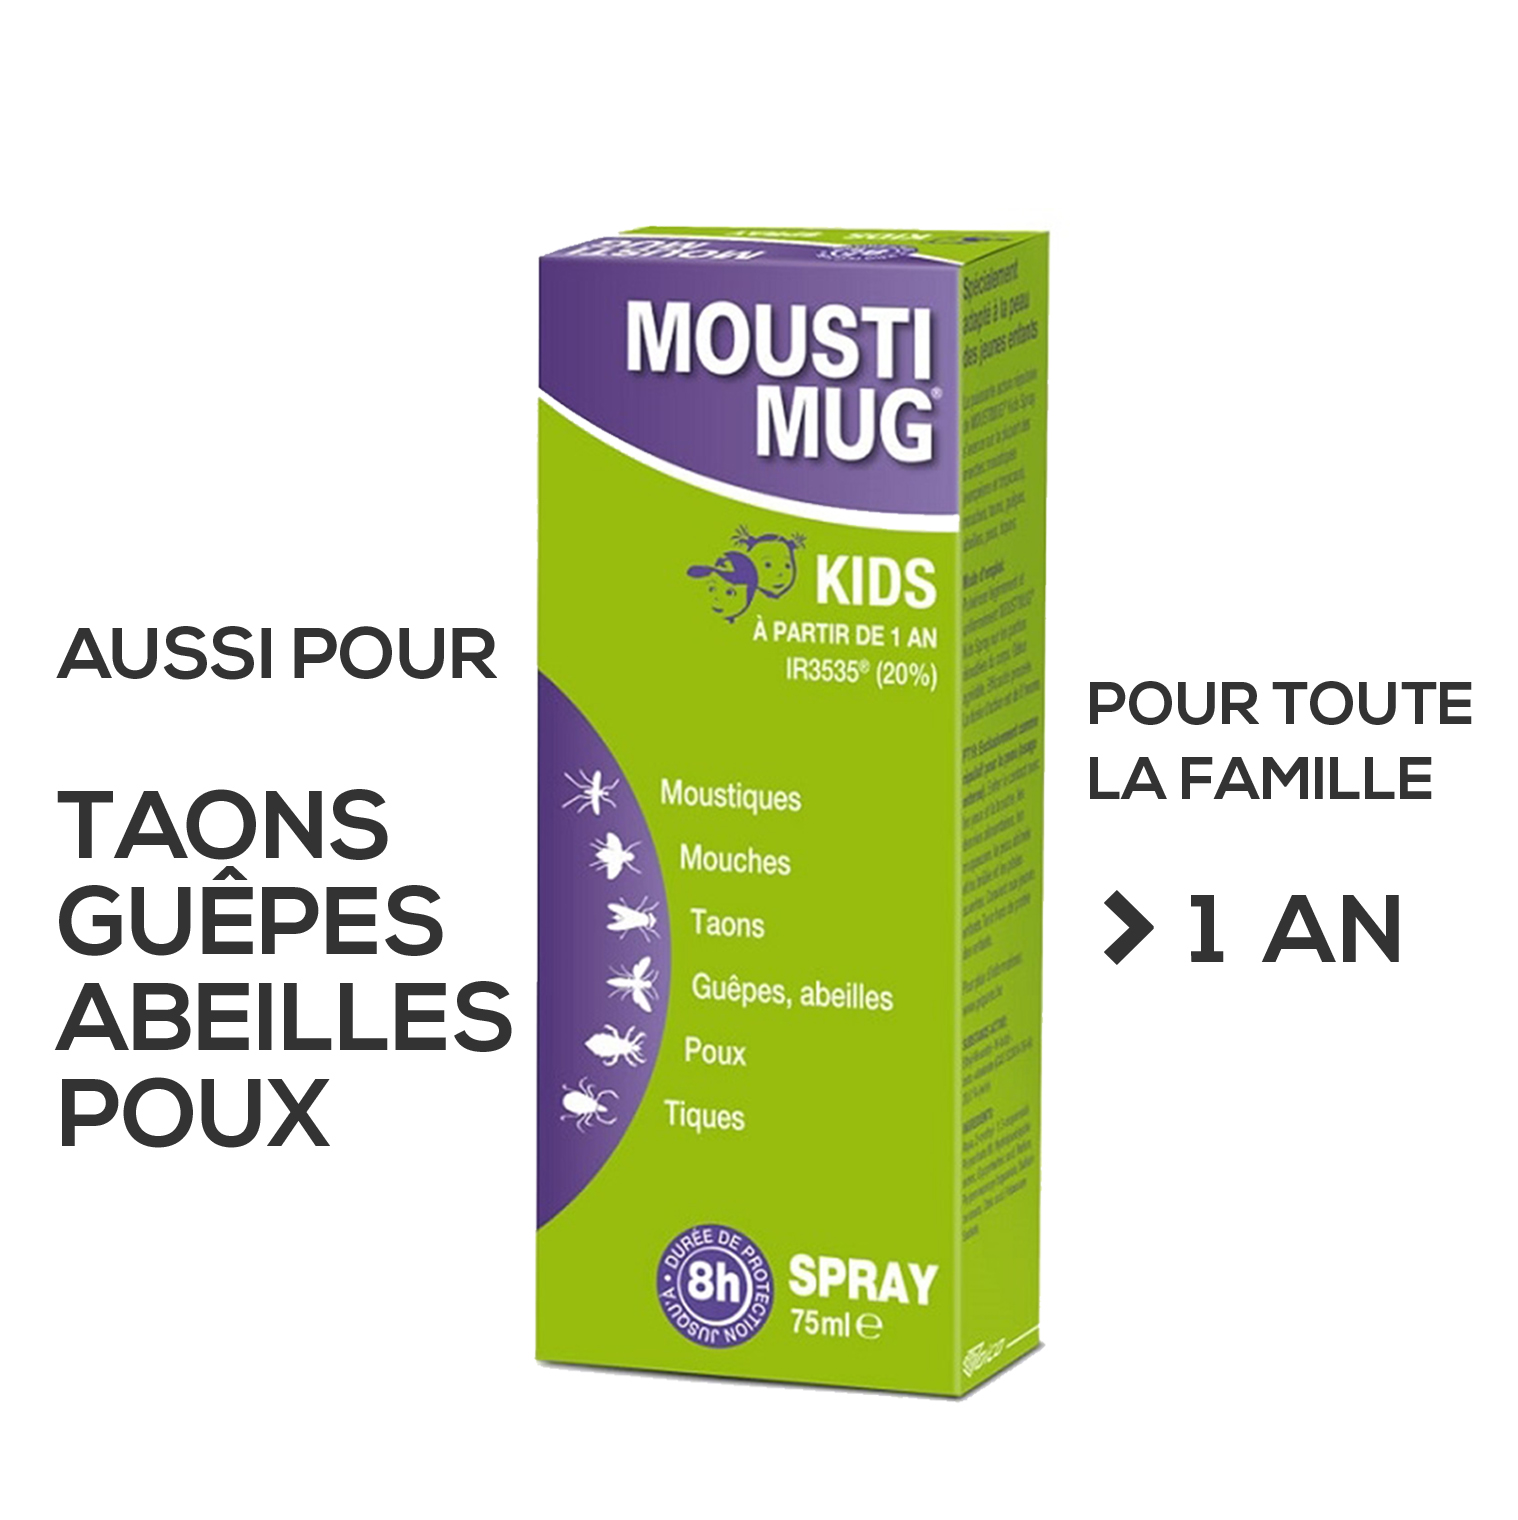 Moustimug Kids Spray Nf 75ml